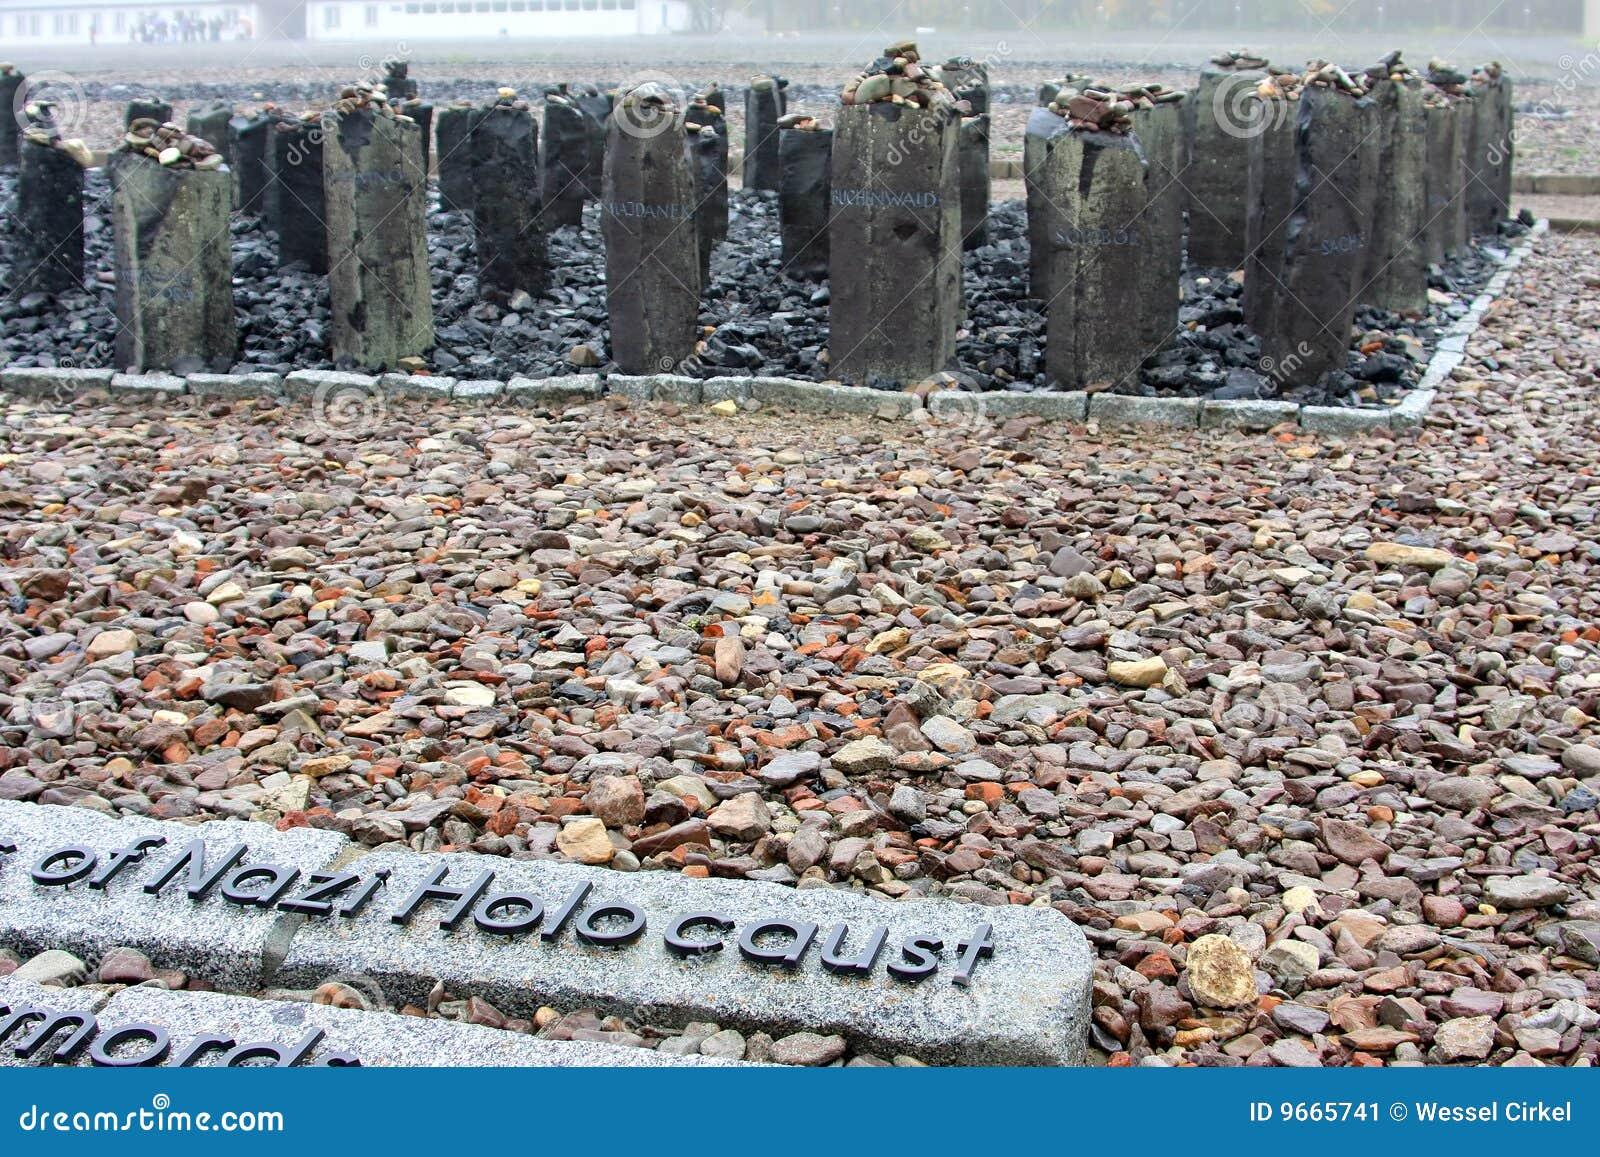 Sinti and Romani Memorial, Buchenwald in Germany